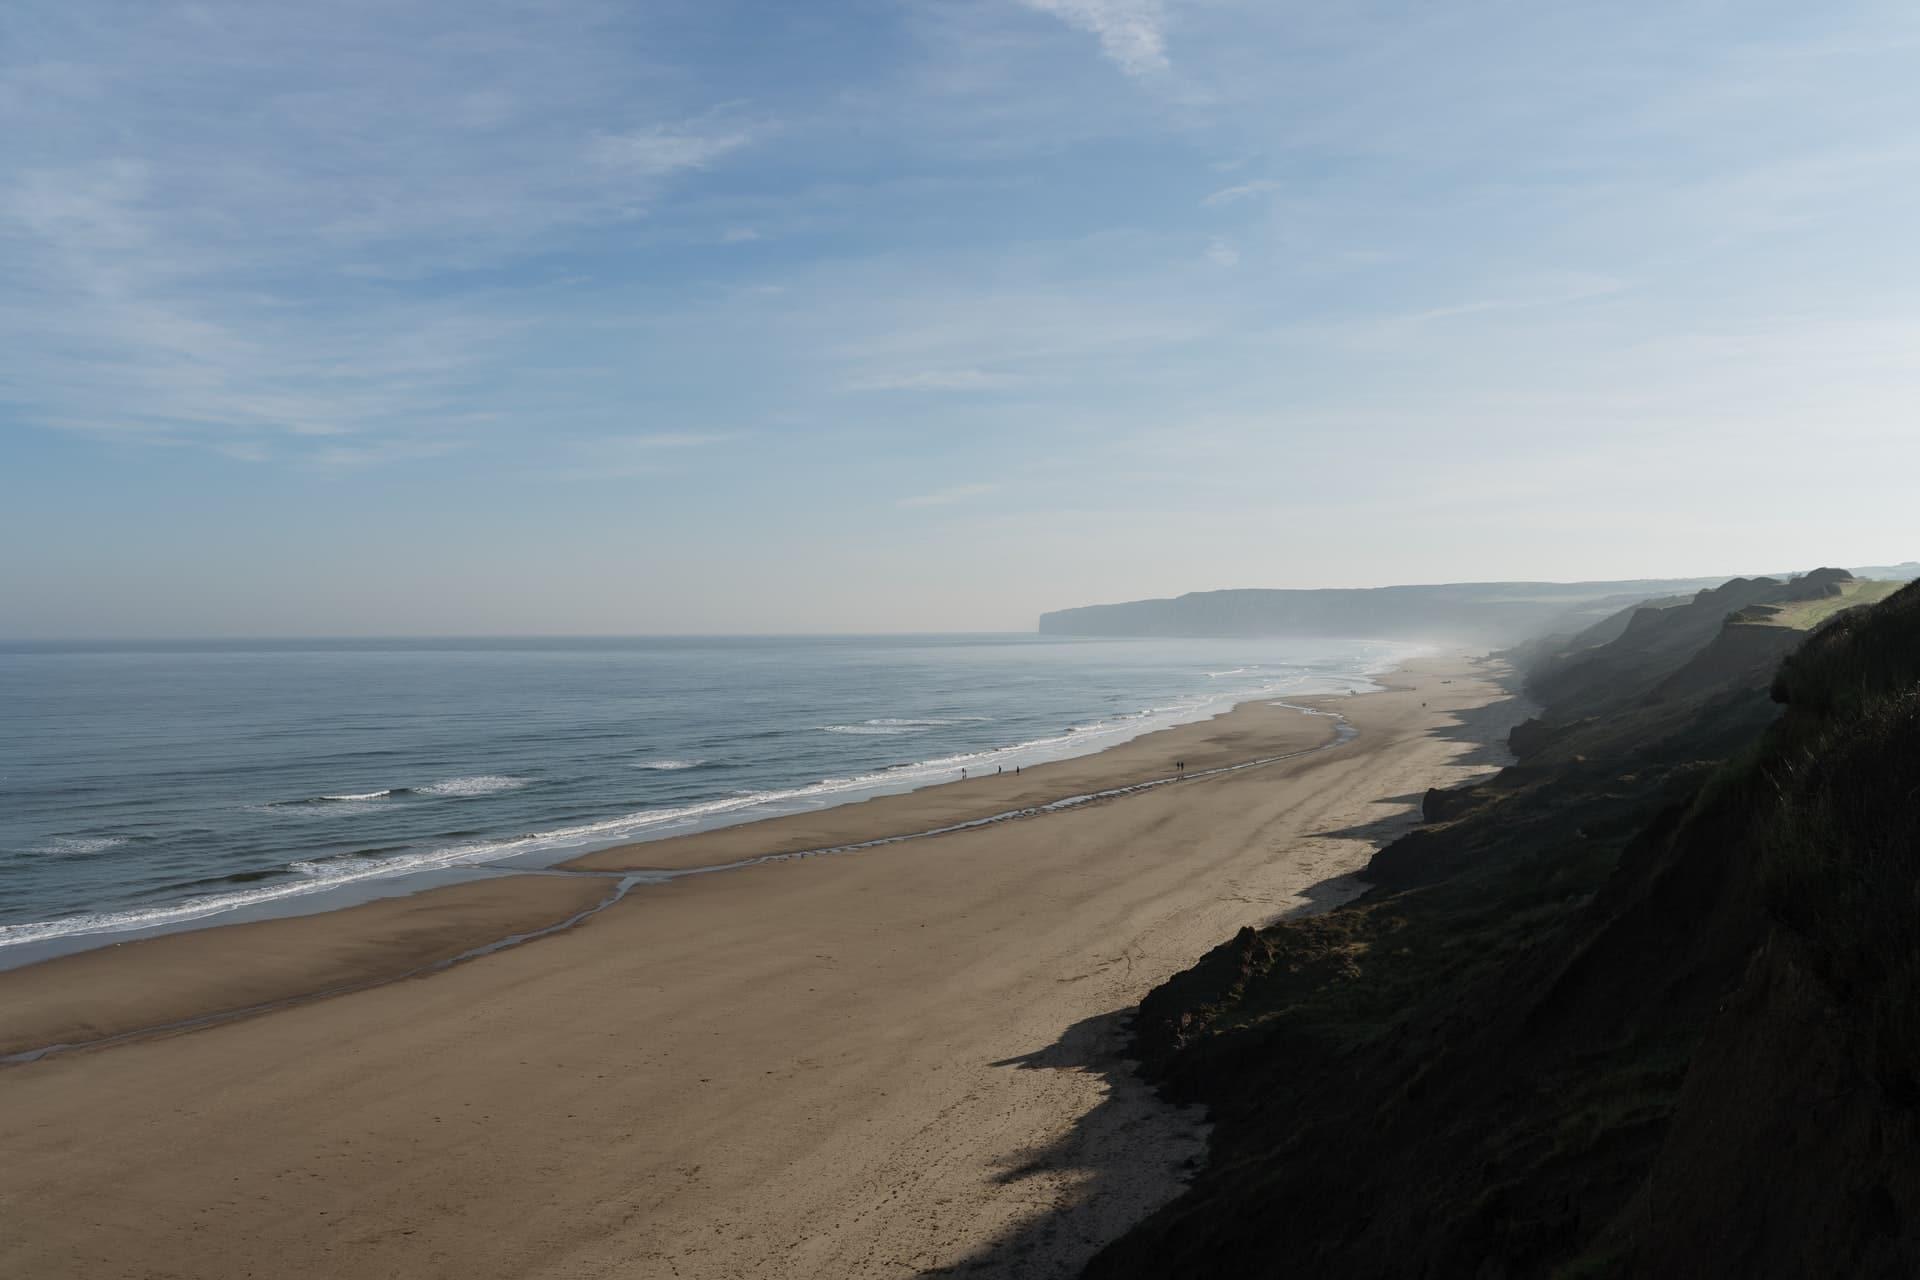 filey beach filey royaume uni uk angleterre